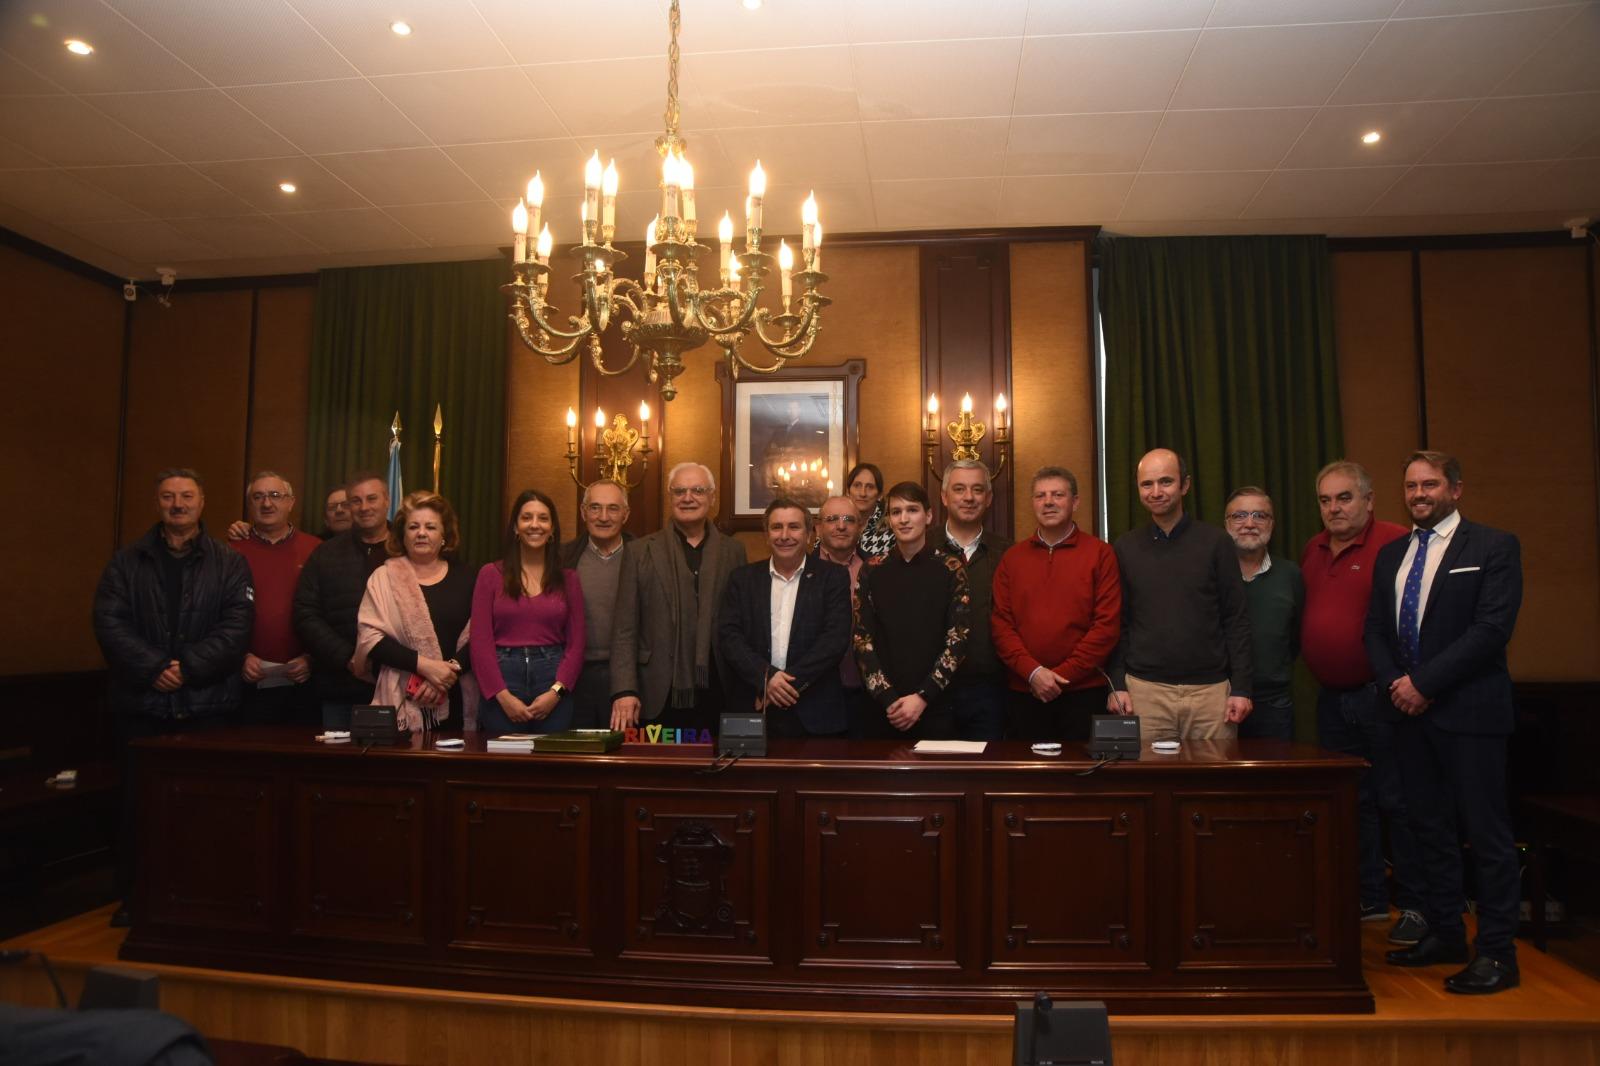 Aceptou o informe da Real Academia Galega